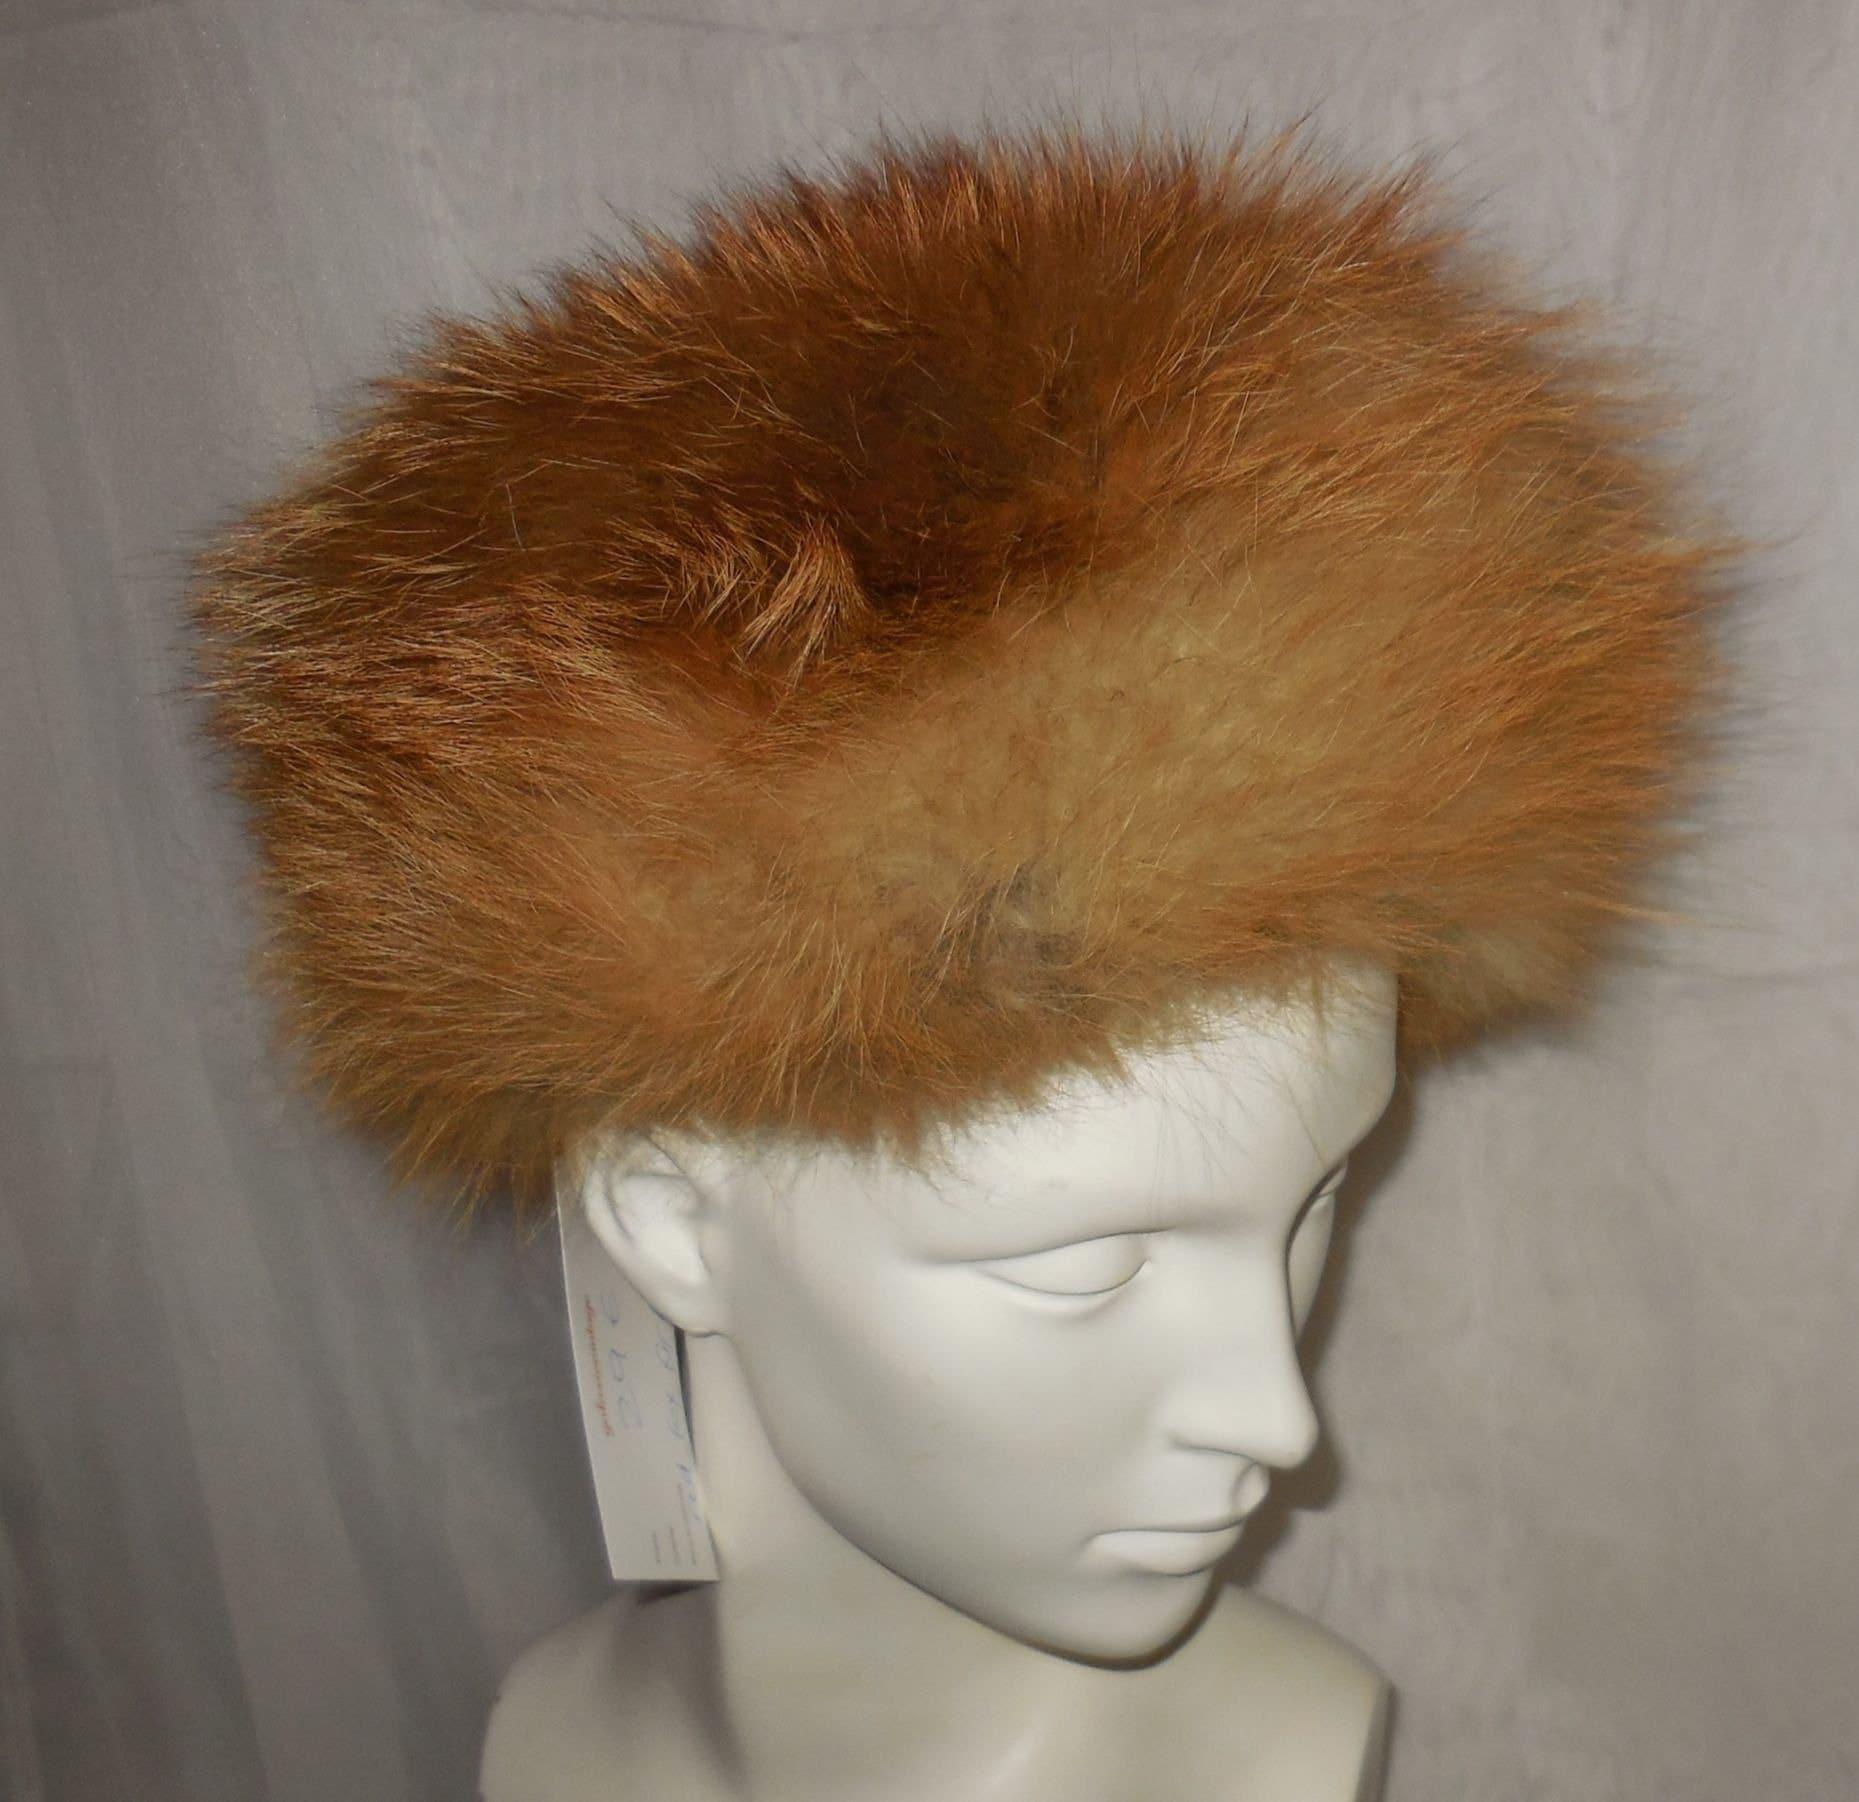 Vintage Fur Hat 1960s 70s Red Fox Fur Oversize Pillbox Pouf Cossack Hat  Boho Apres Ski 22 22.5 inches f7b9580299d